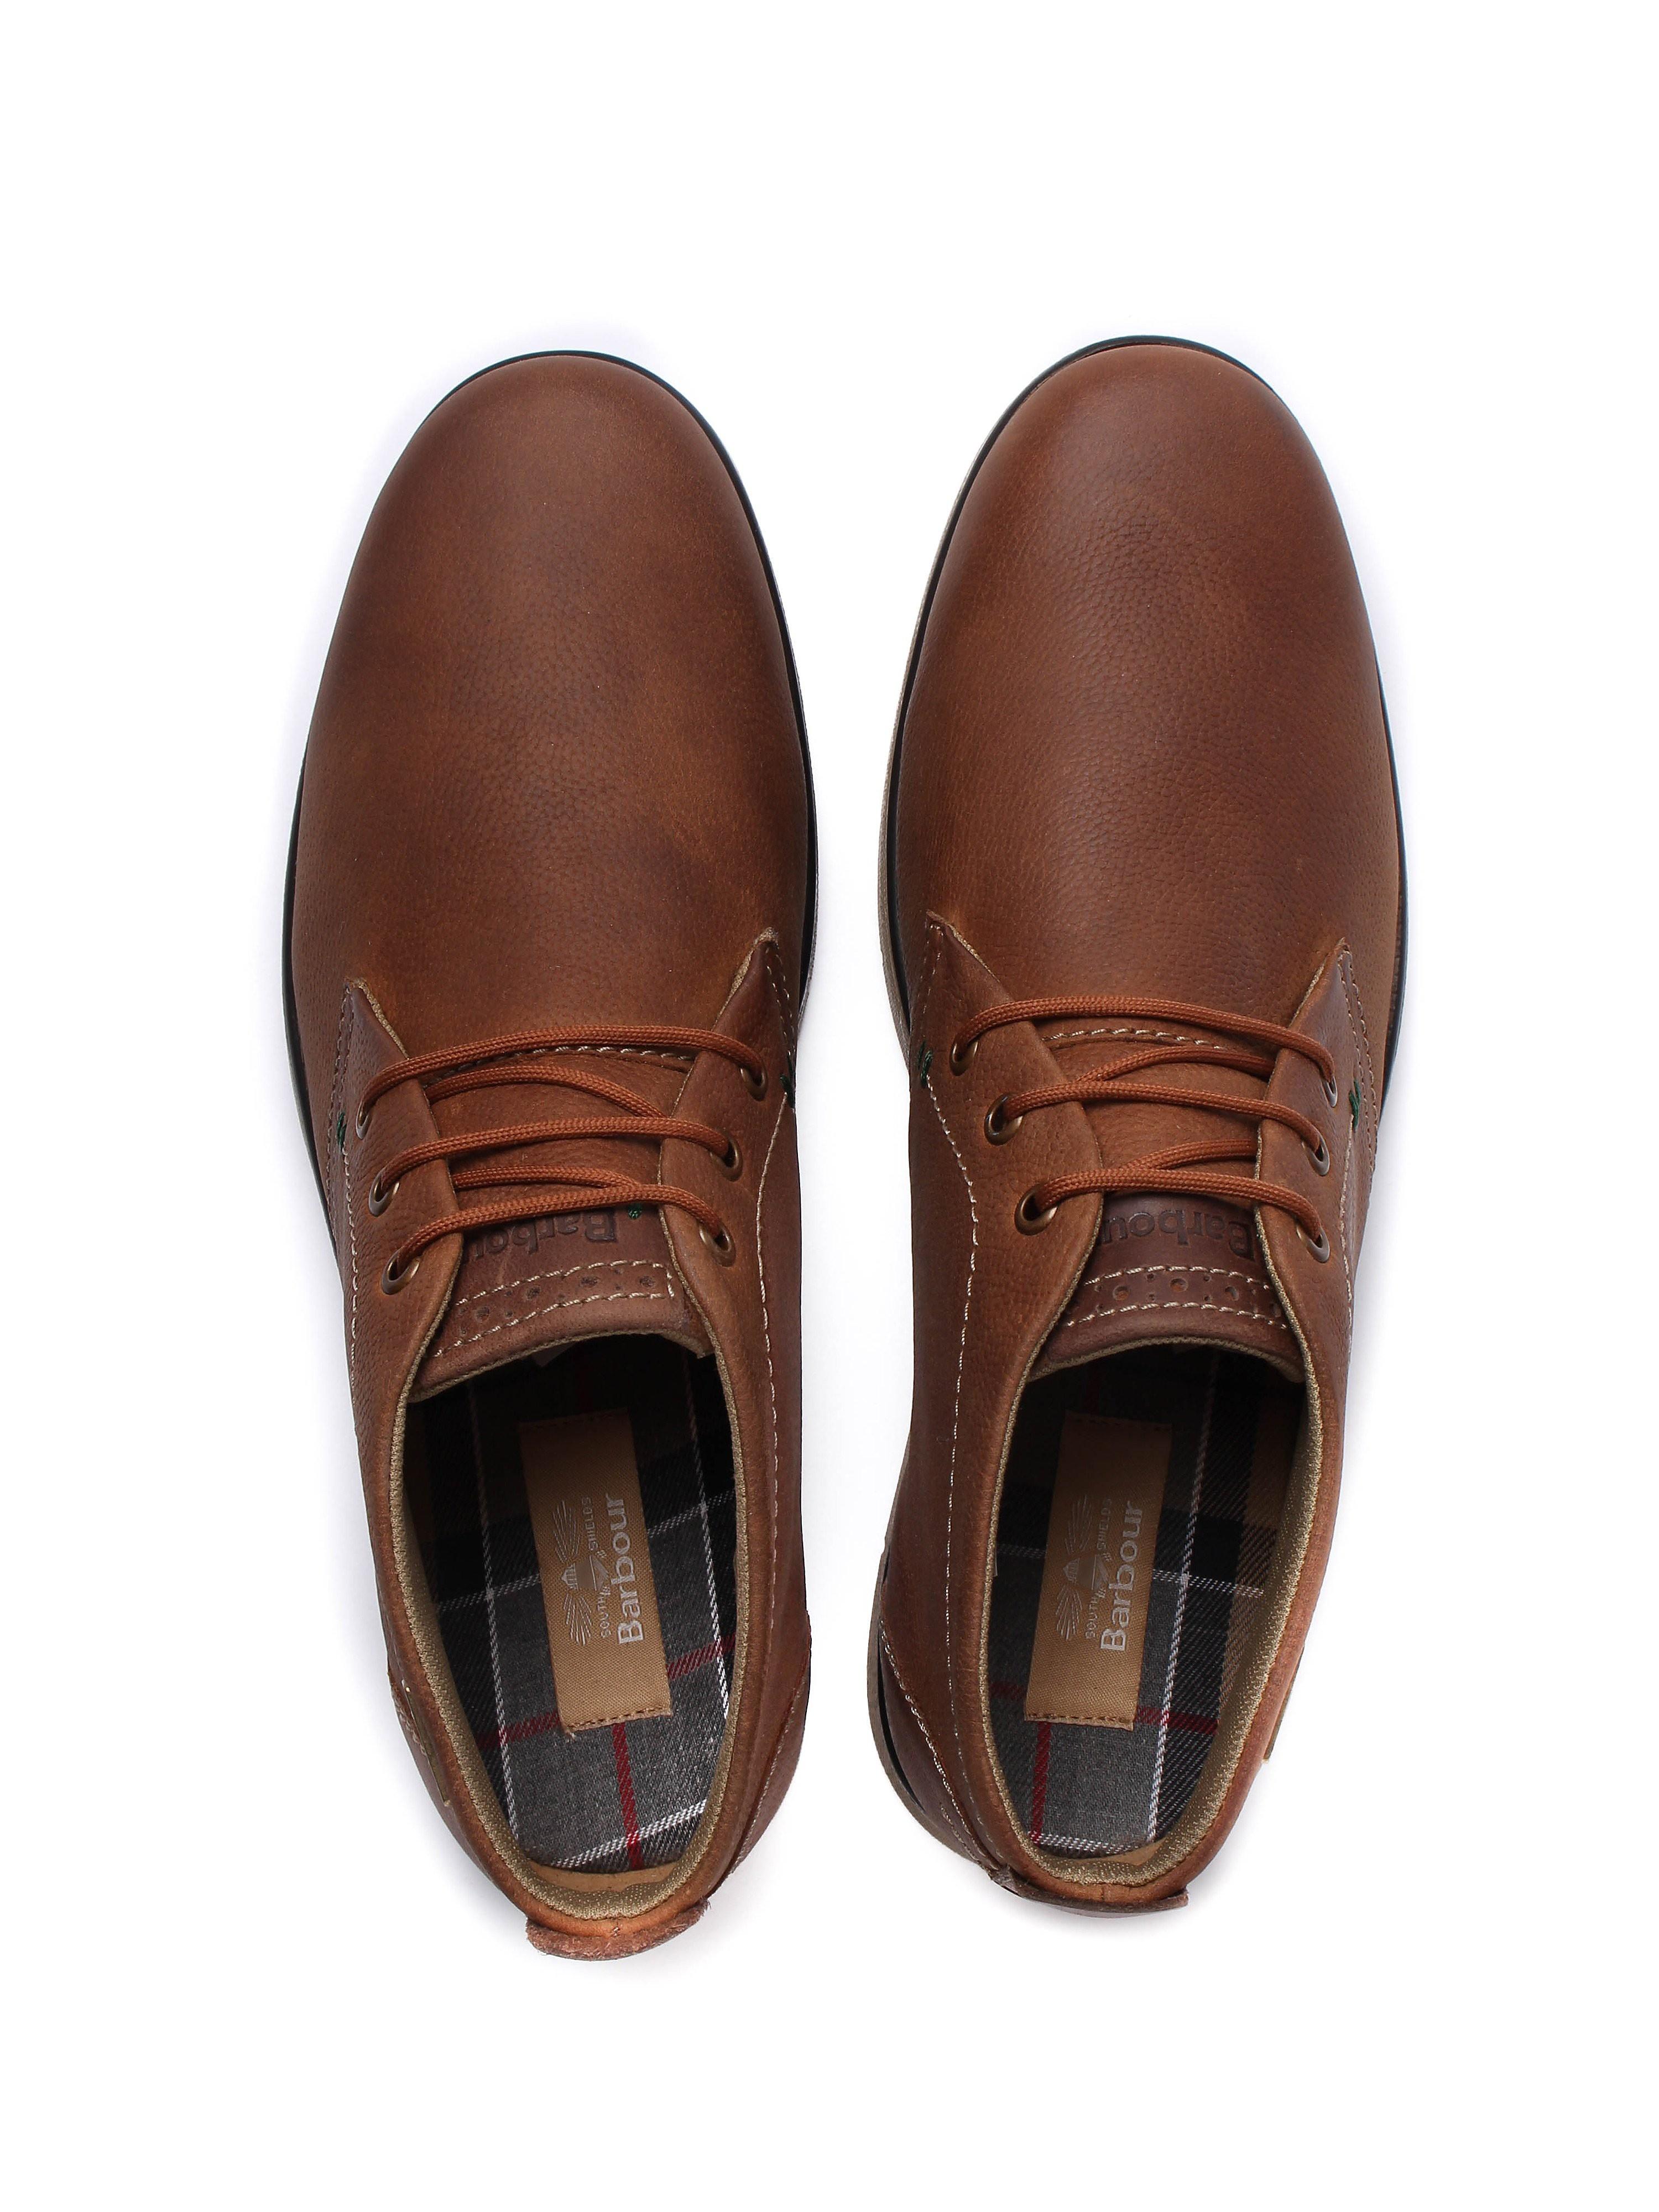 Barbour Men's Bowlam Nubuck Chukka Boots - Cognac